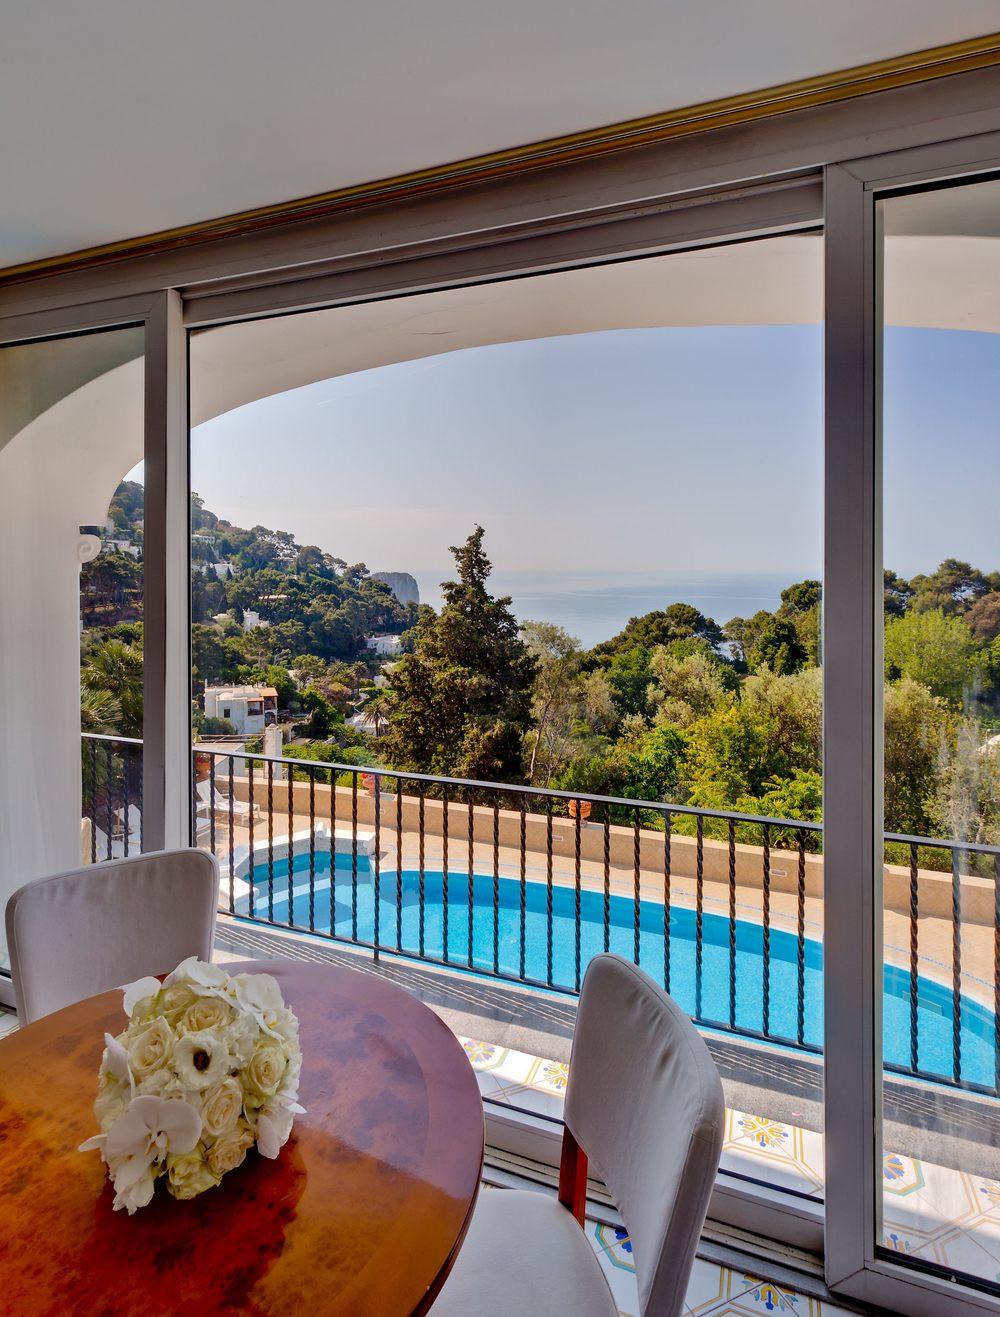 Hotel-Mamela-Capri-Italy-14.jpg